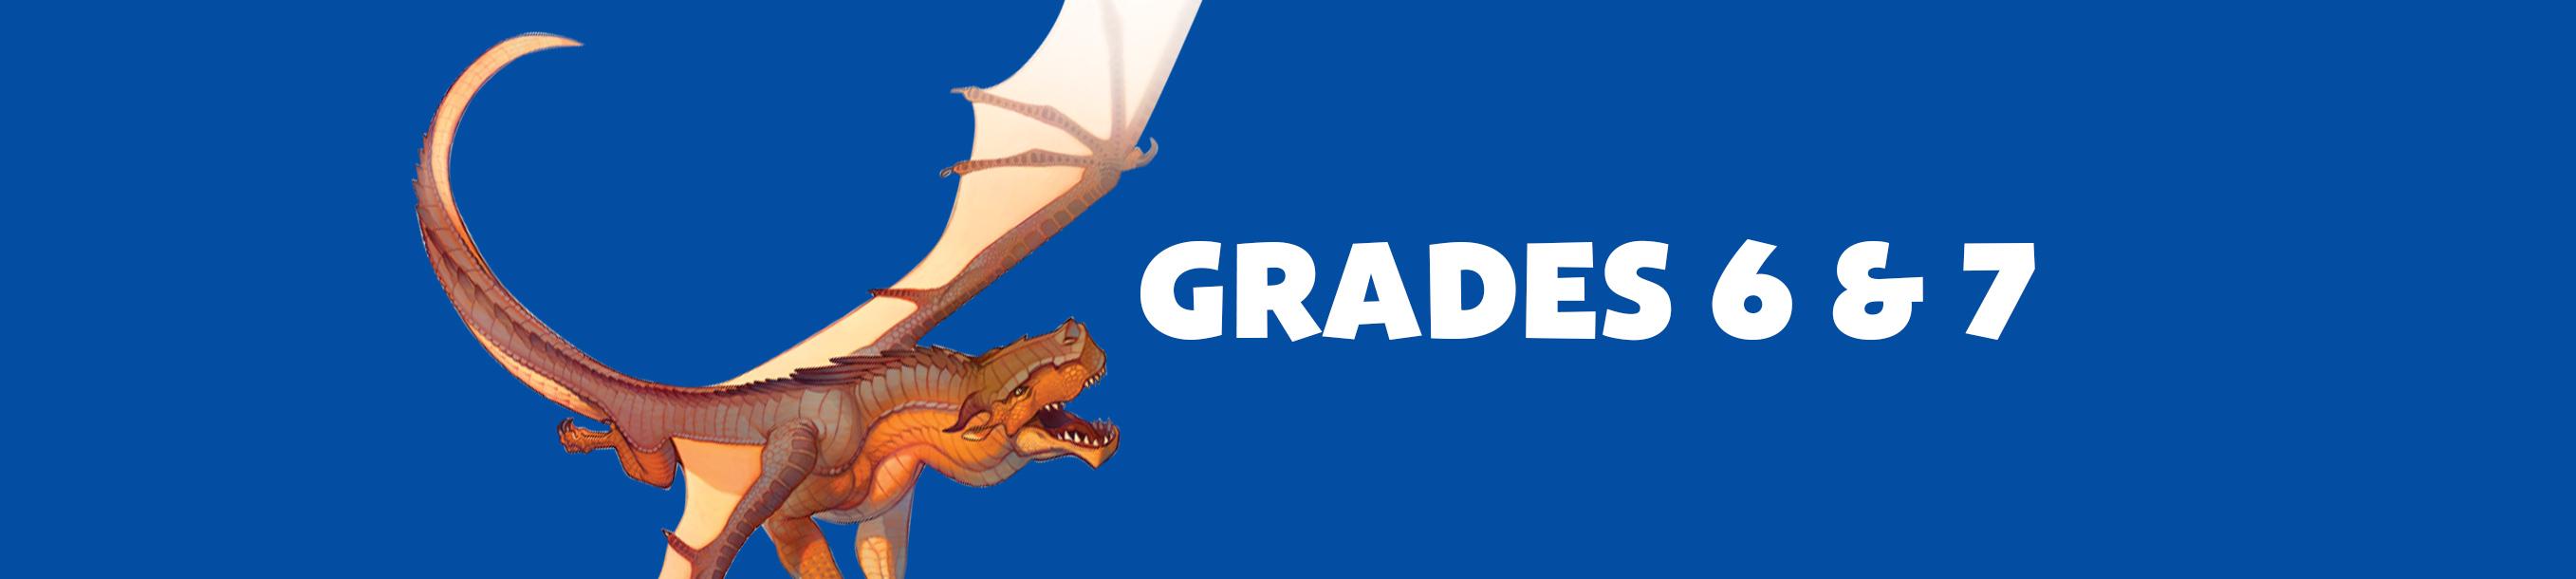 Grades 6 & 7